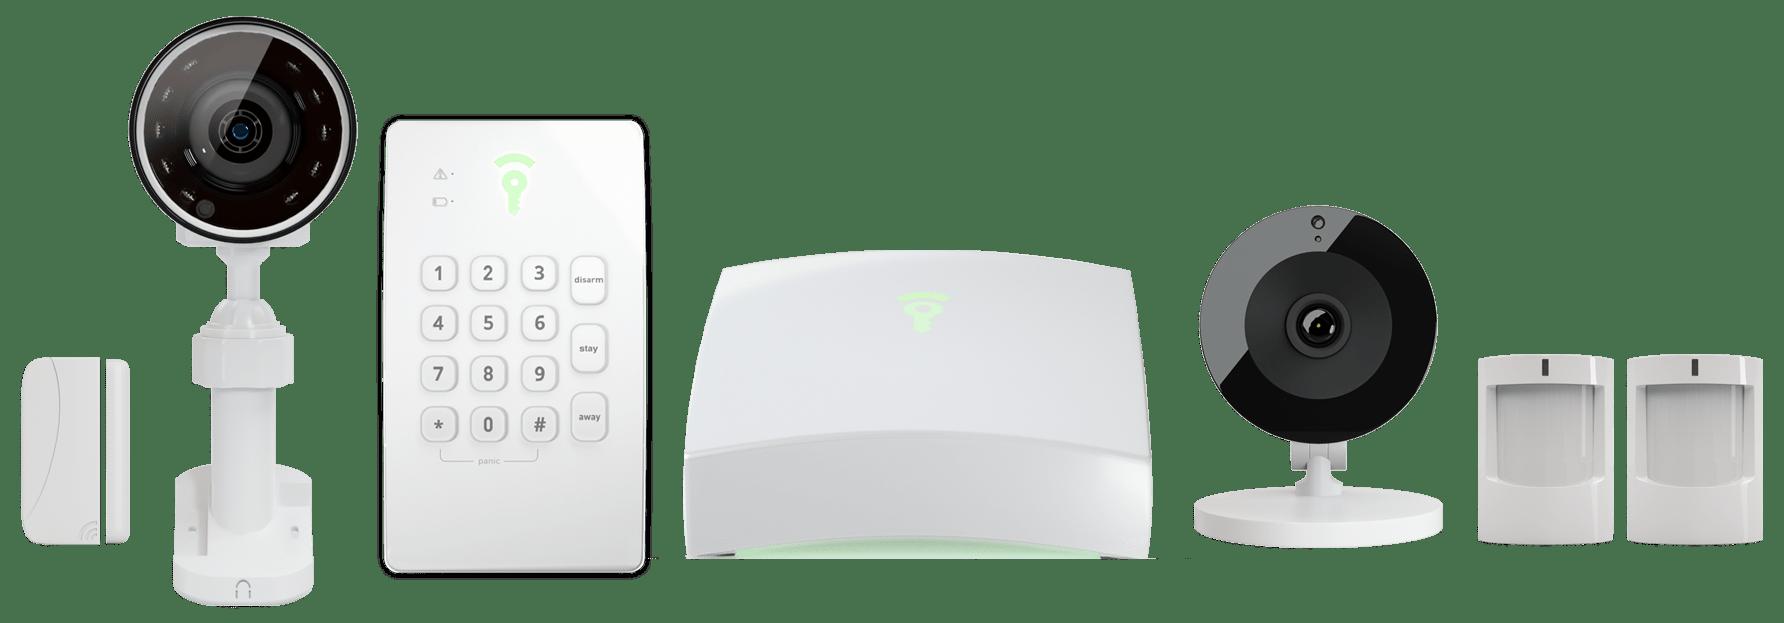 Burglar Alarms Systems - Installation & Monitoring 1